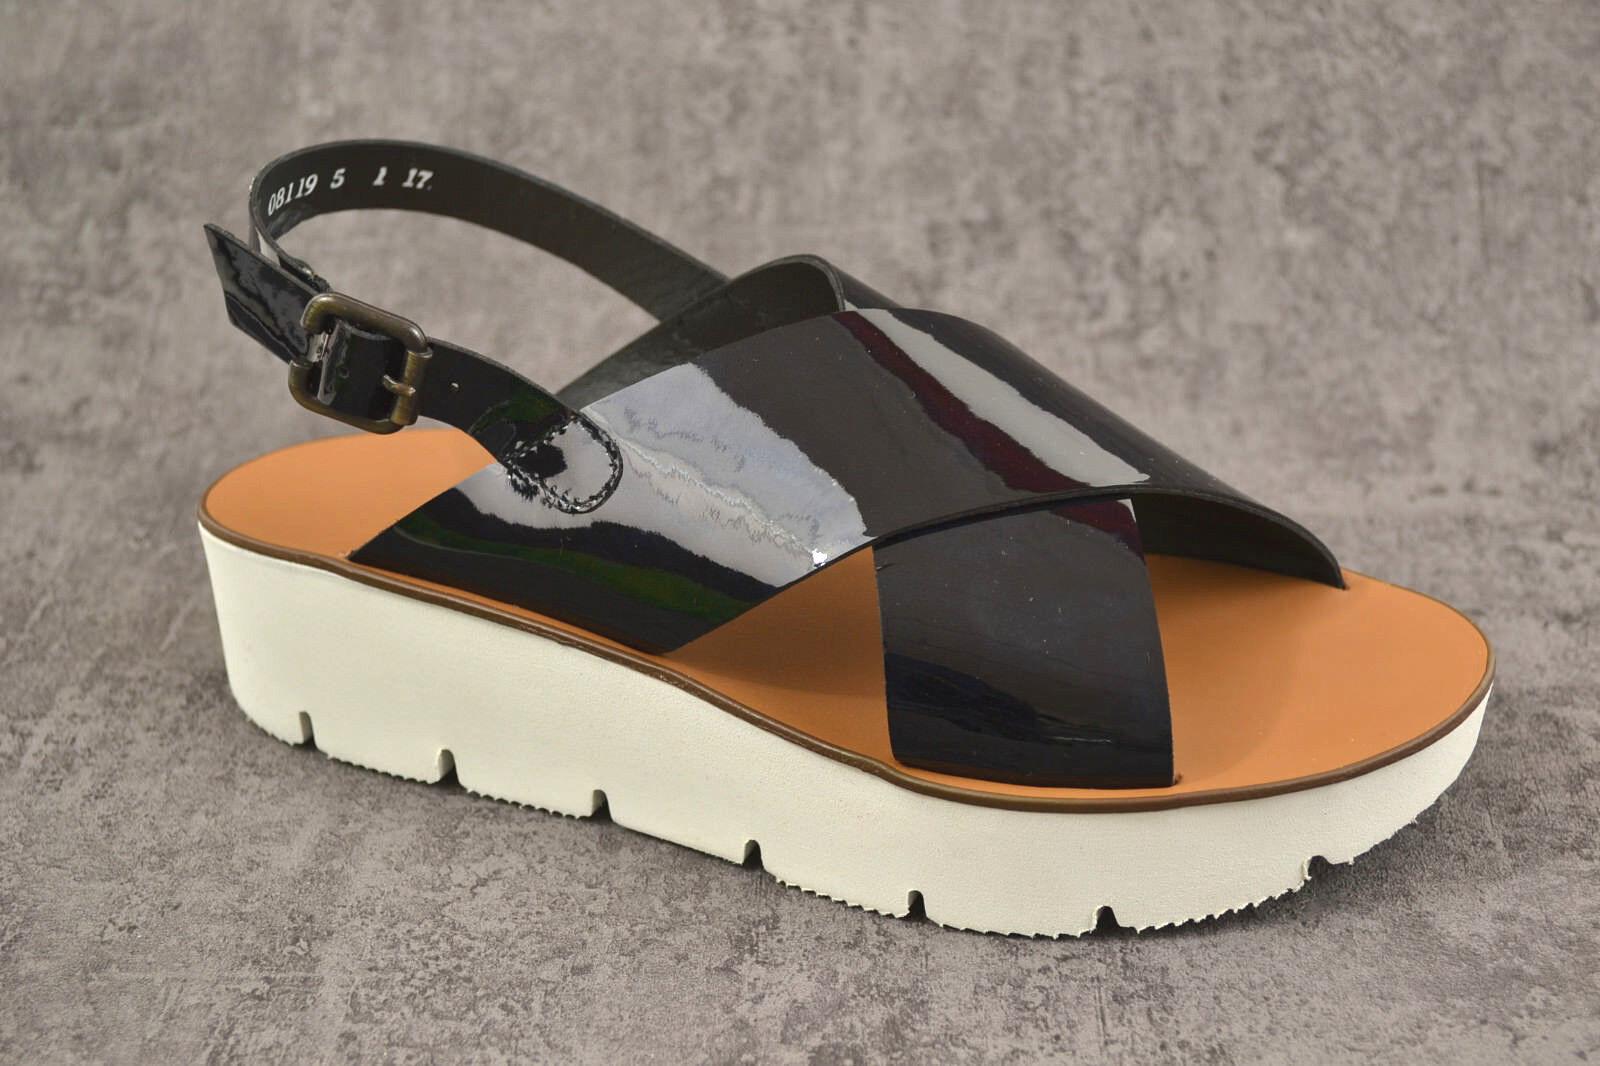 NEU NEU NEU Paul Grün Damen Sandalen Sandalette soft Lack schwarz NEU 89c0e3